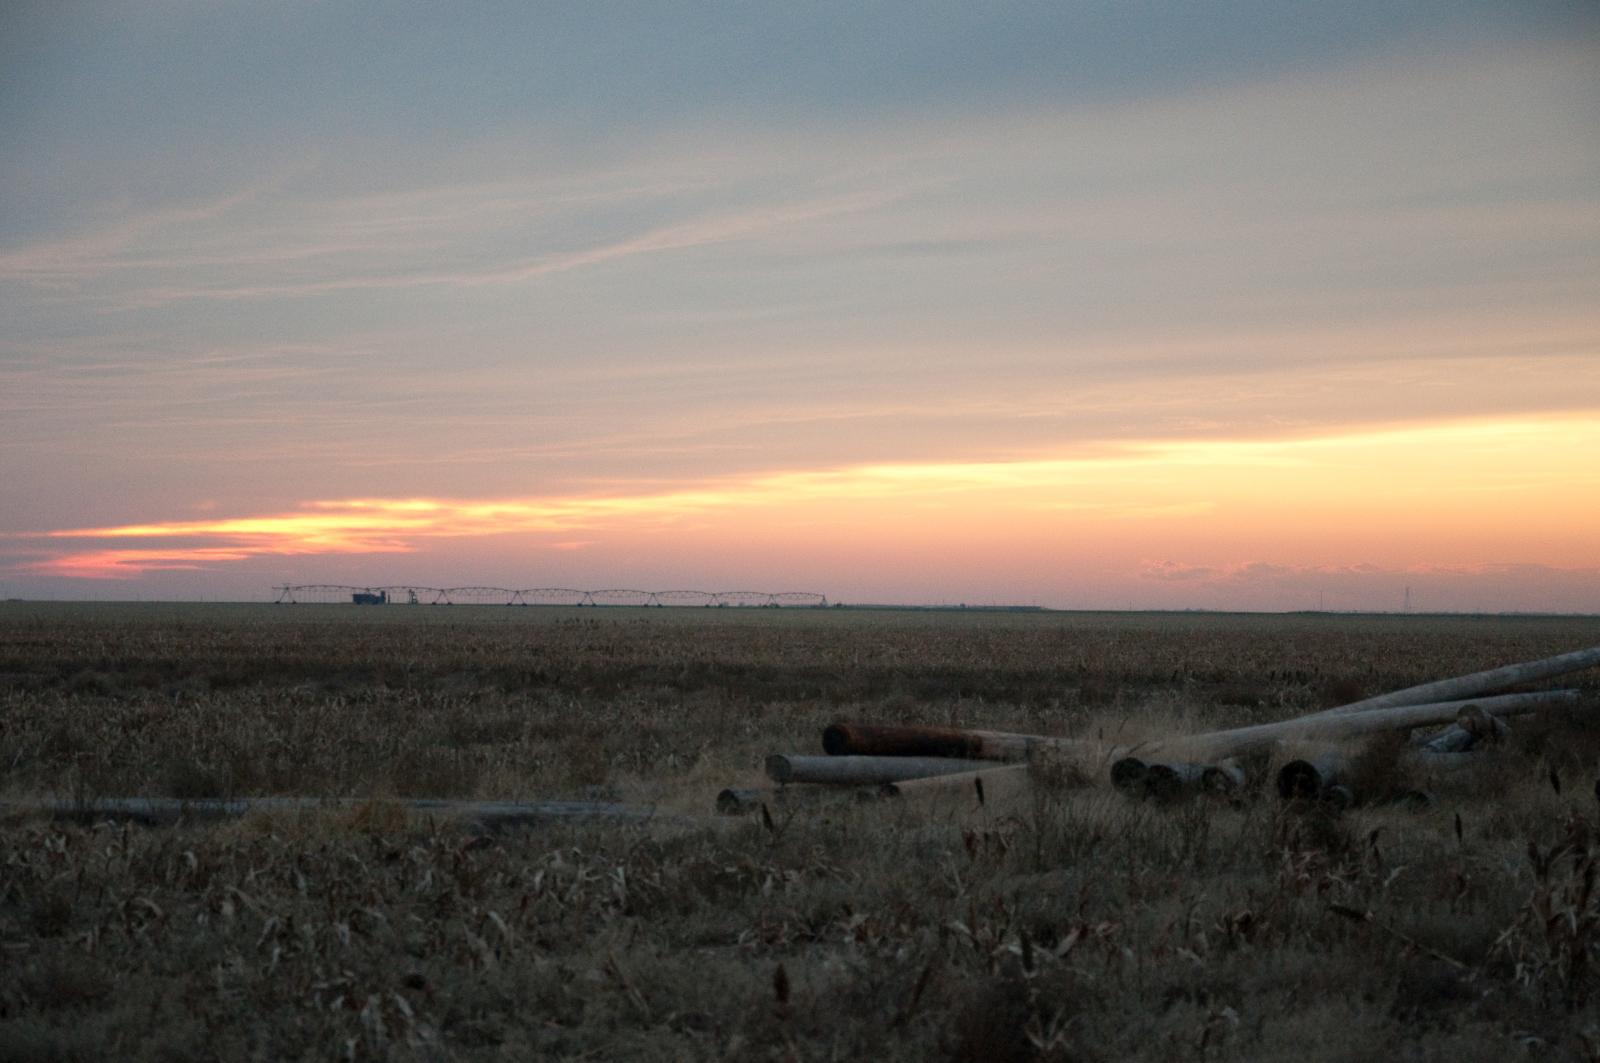 Kansas gray county copeland - Pheasant Farming Hunting Kansas Copeland Sublette Nikond90